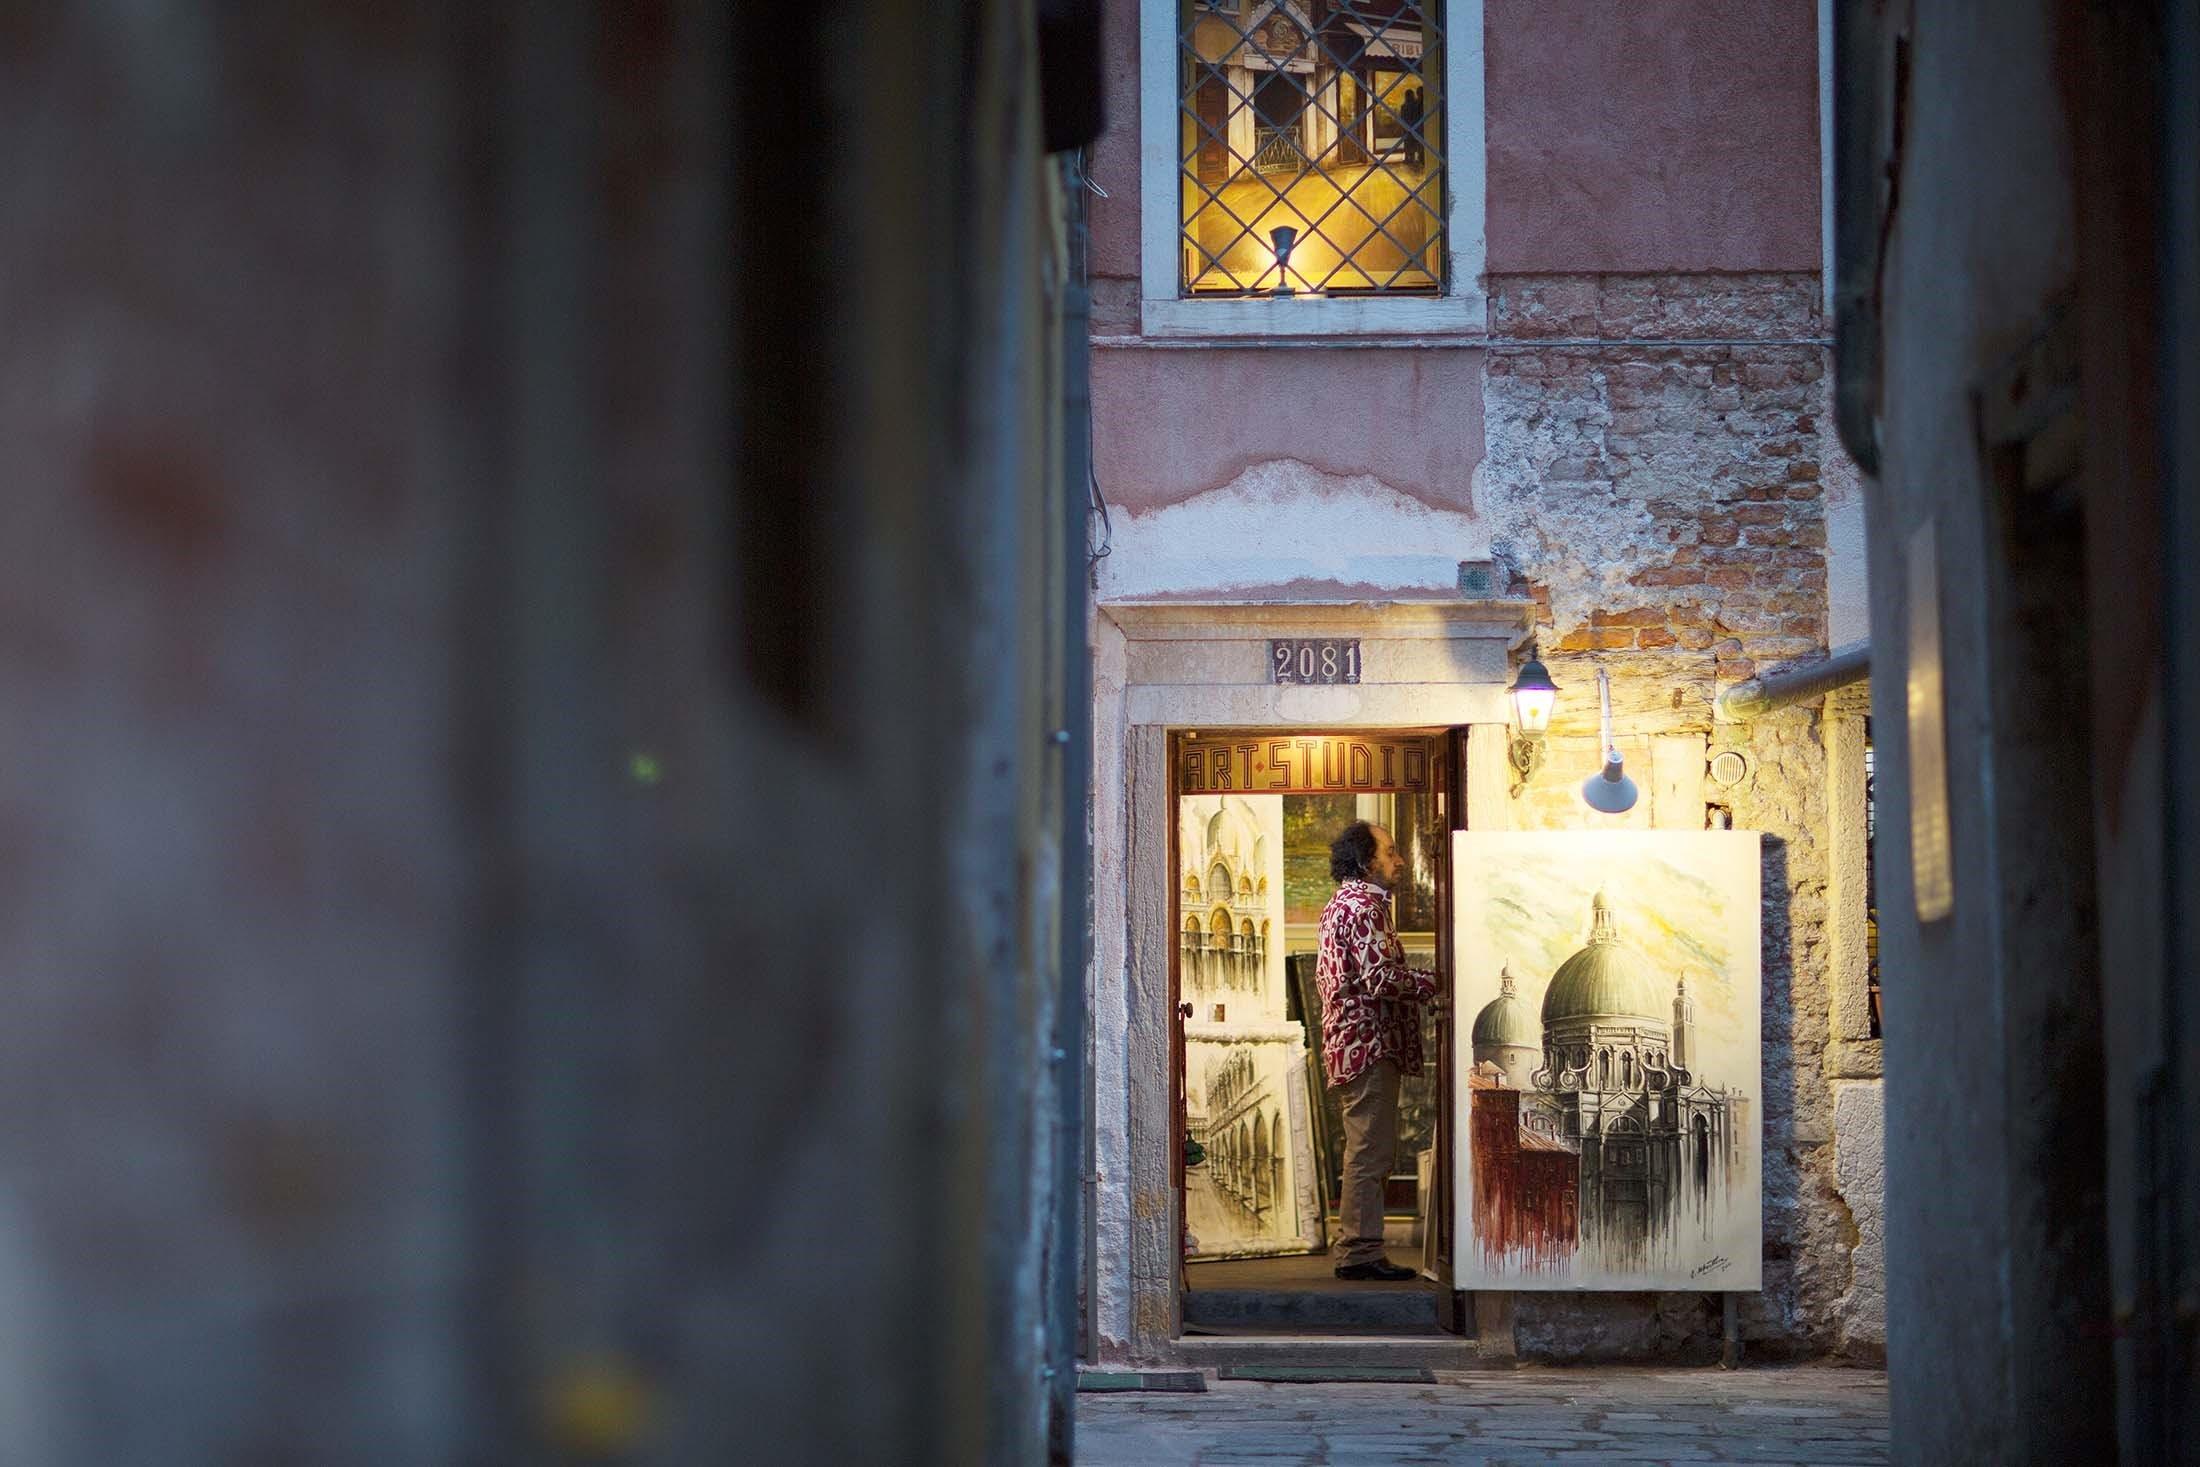 Art in Venice, Italy